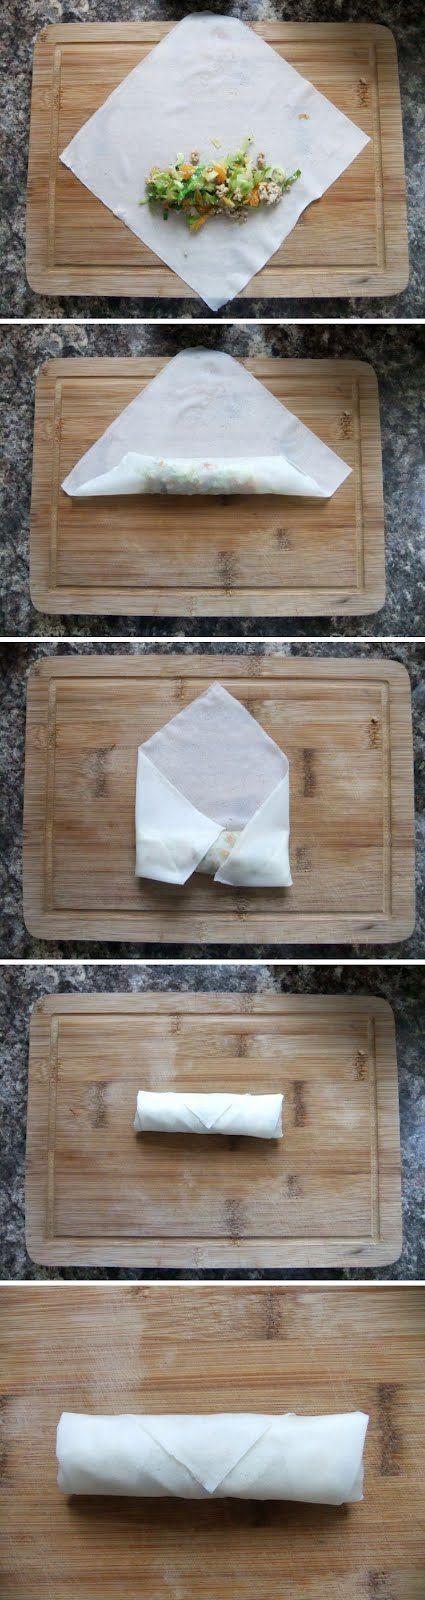 How to fold Egg rolls / Lumpia #diy #crafts www.BlueRainbowDesign.com